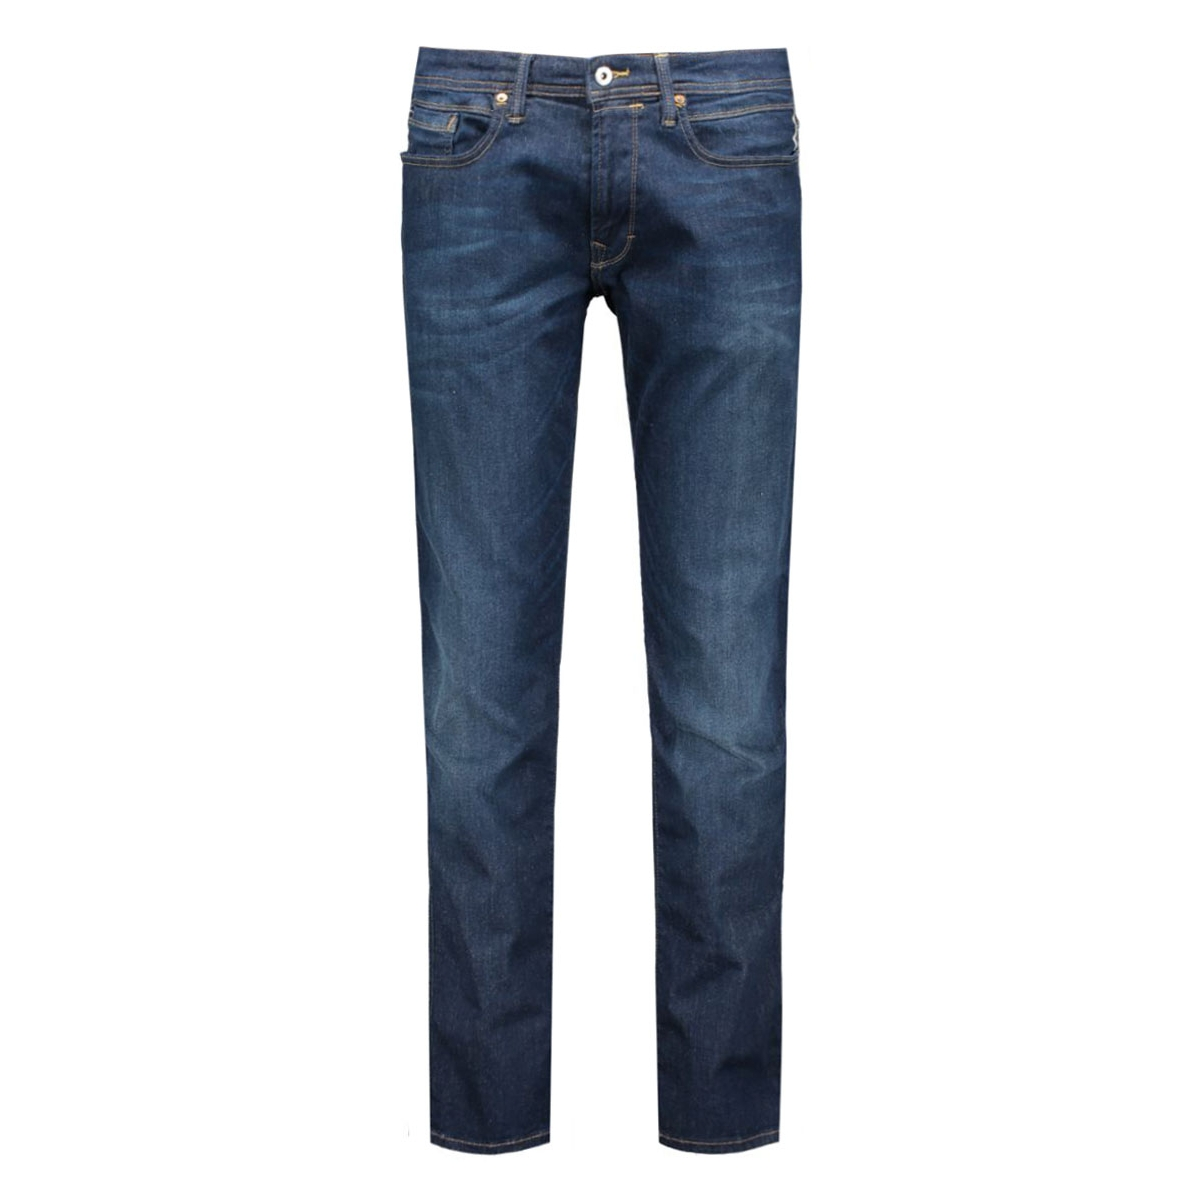 096cc2b009 edc jeans c901